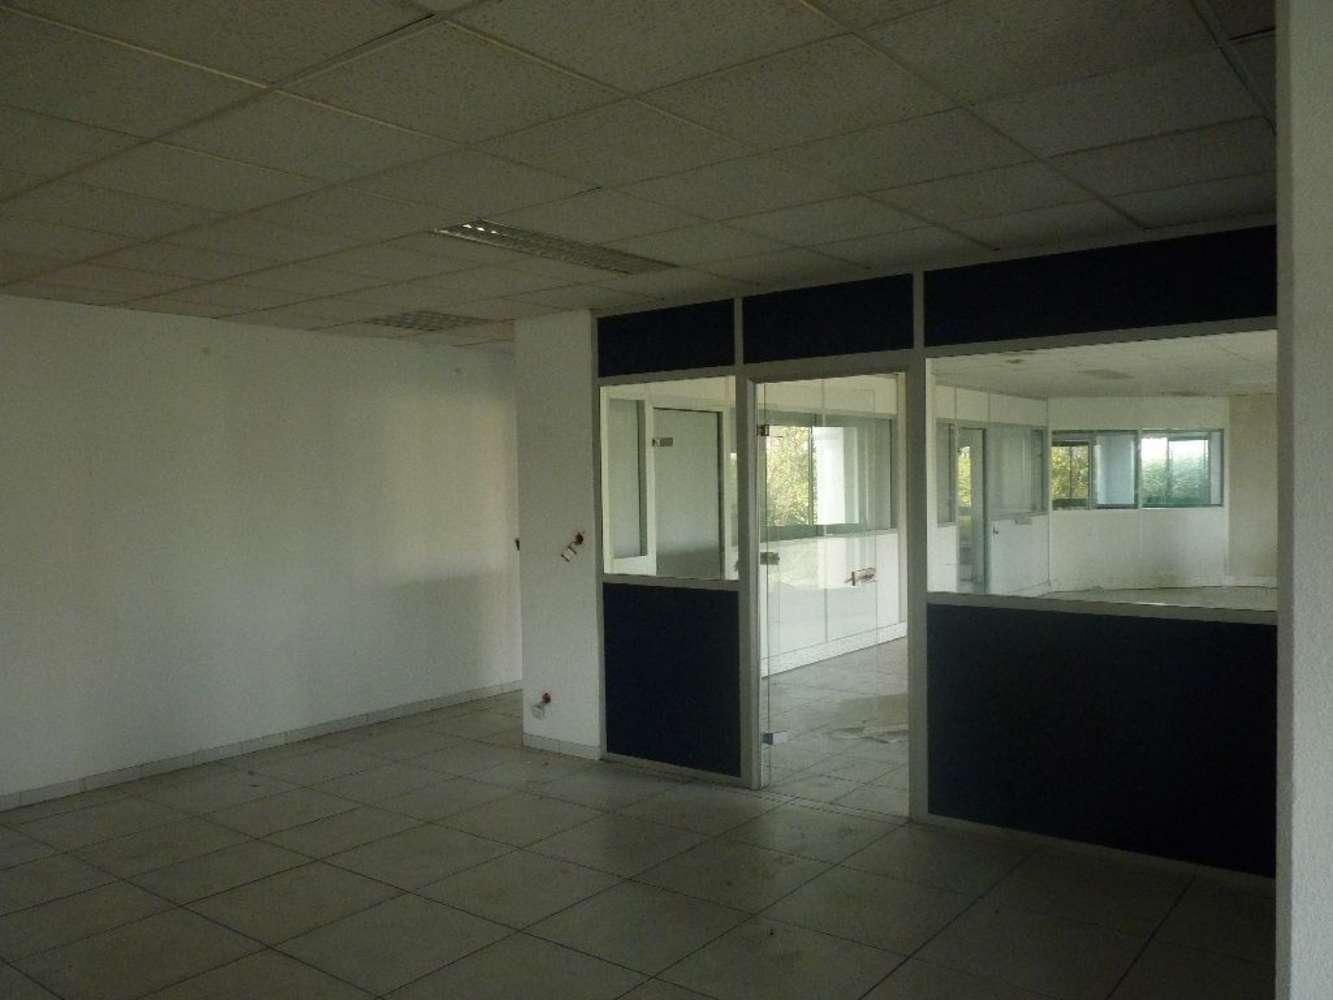 Activités/entrepôt Genas, 69740 - Location entrepot Genas - Lyon Est (69) - 10322582